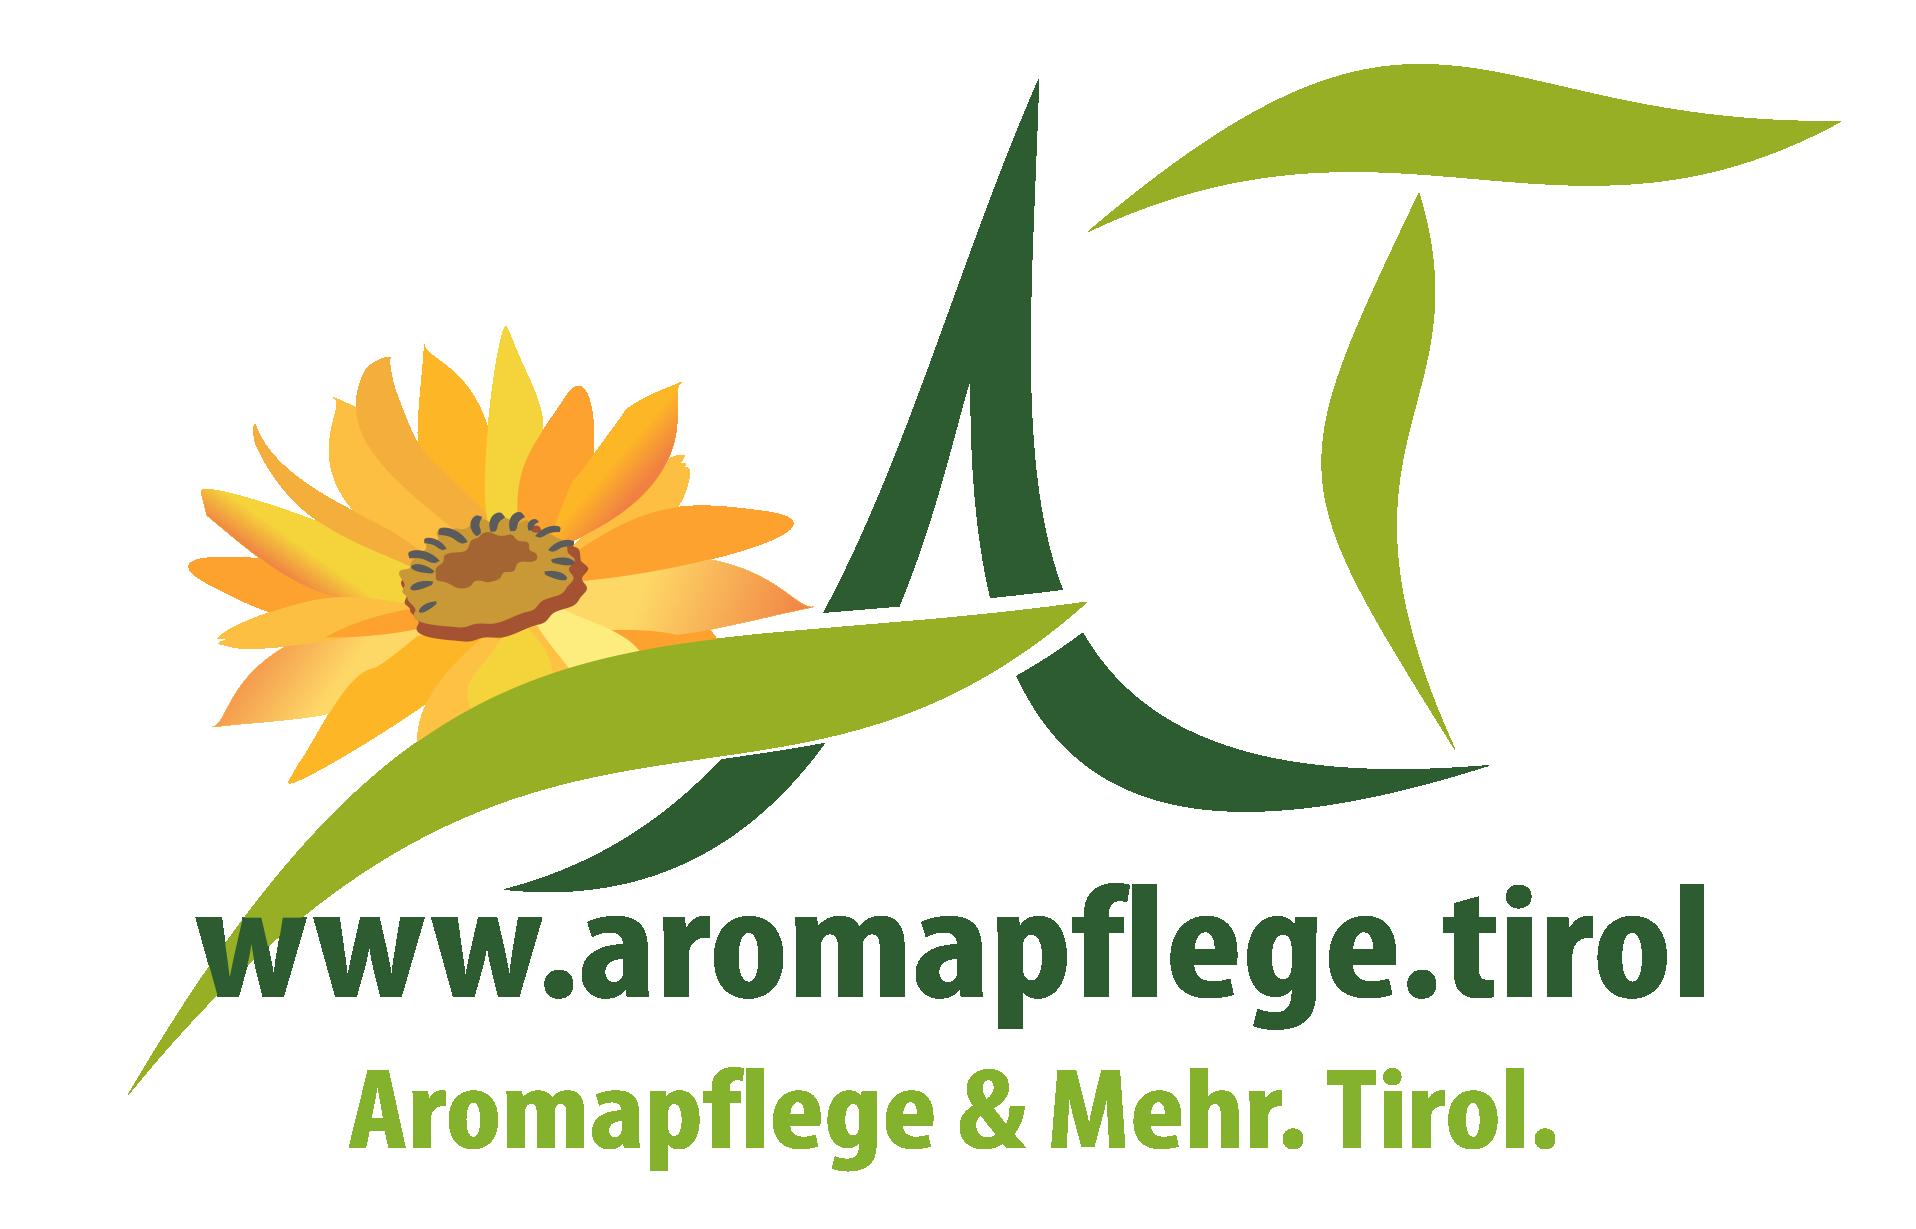 aromapflege.tirol